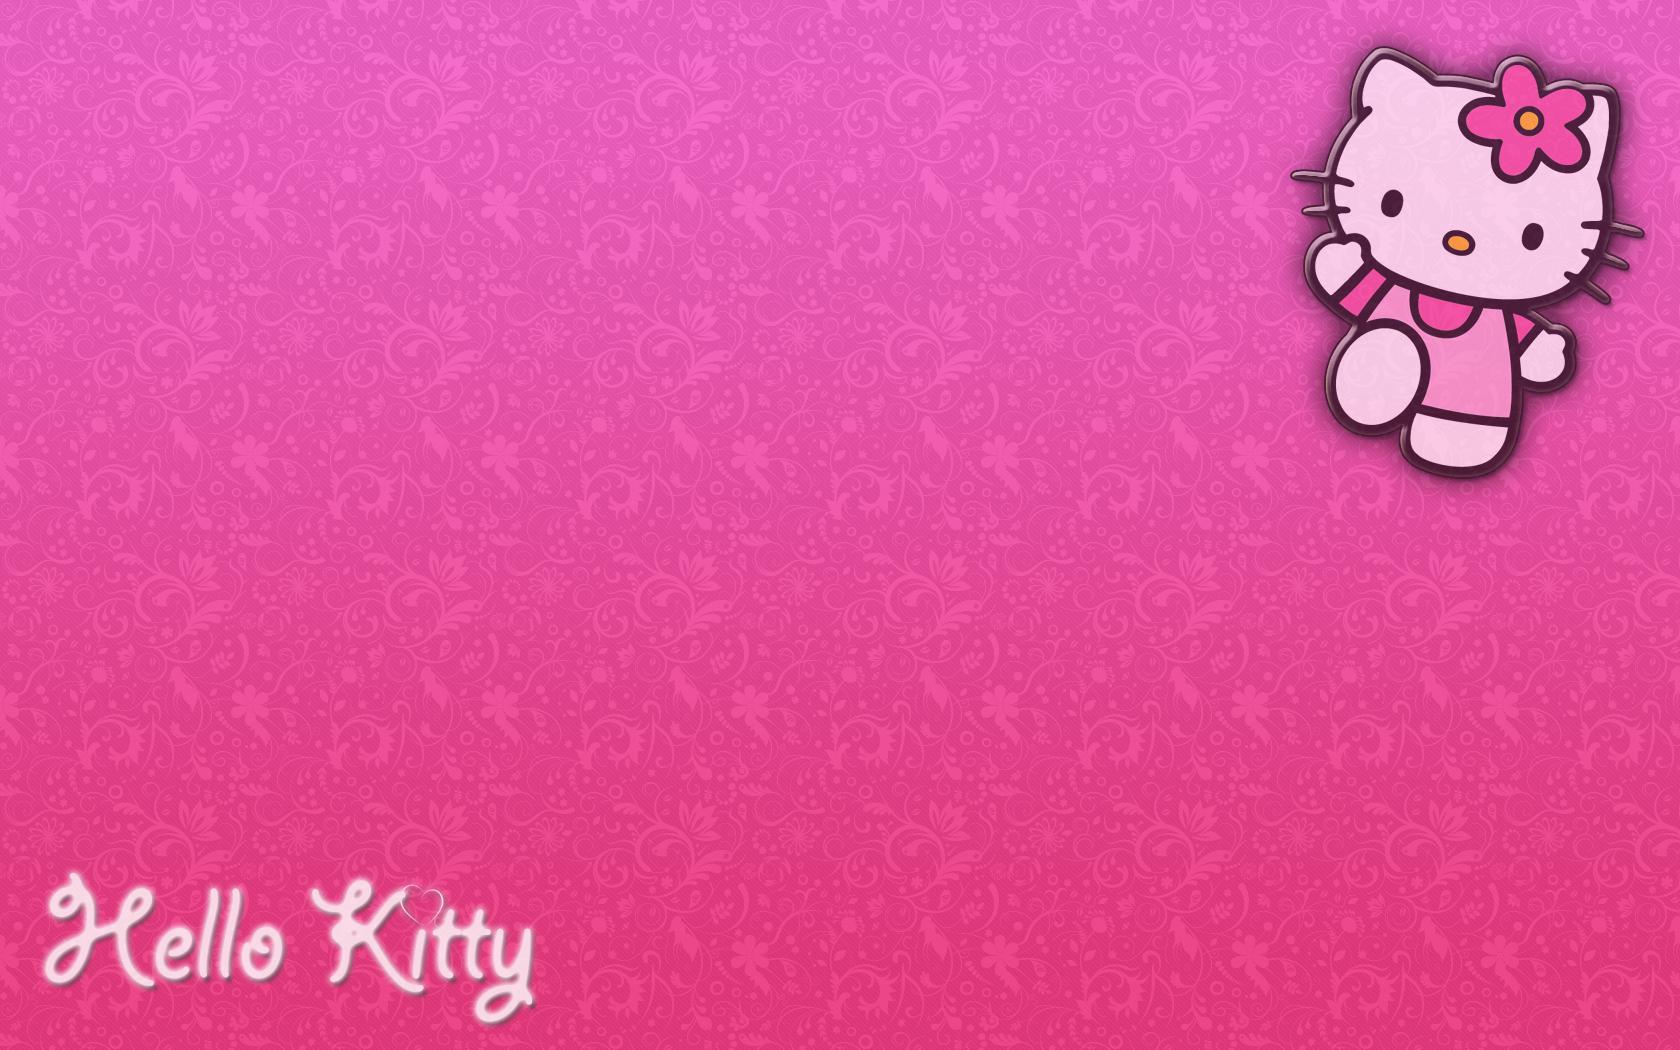 Hello Kitty Cute Backgrounds Wallpaper Wide ImageBankbiz 1680x1050